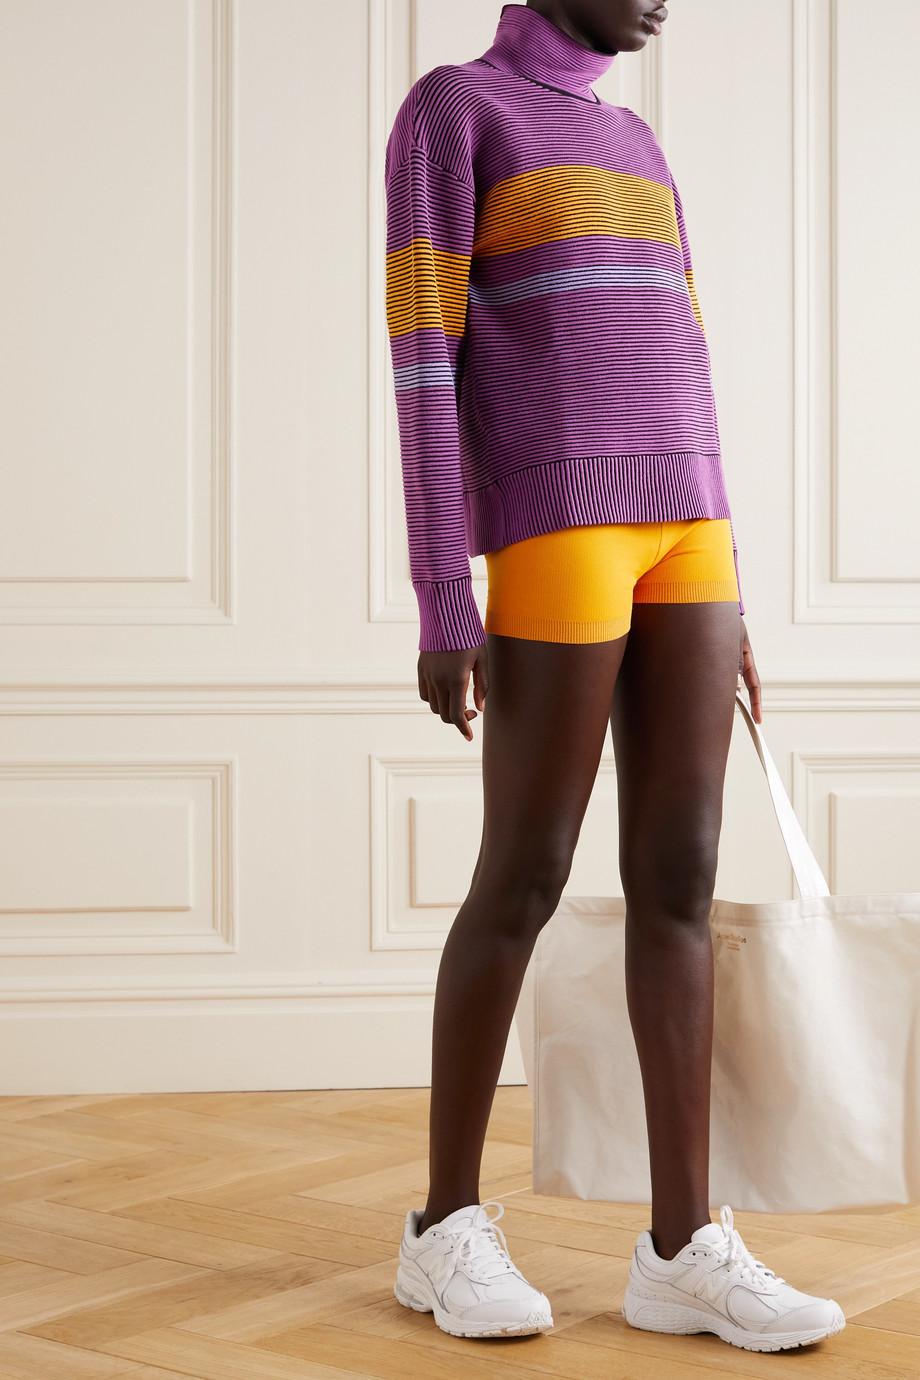 Nagnata + NET SUSTAIN Sama Retro striped ribbed organic cotton sweatshirt